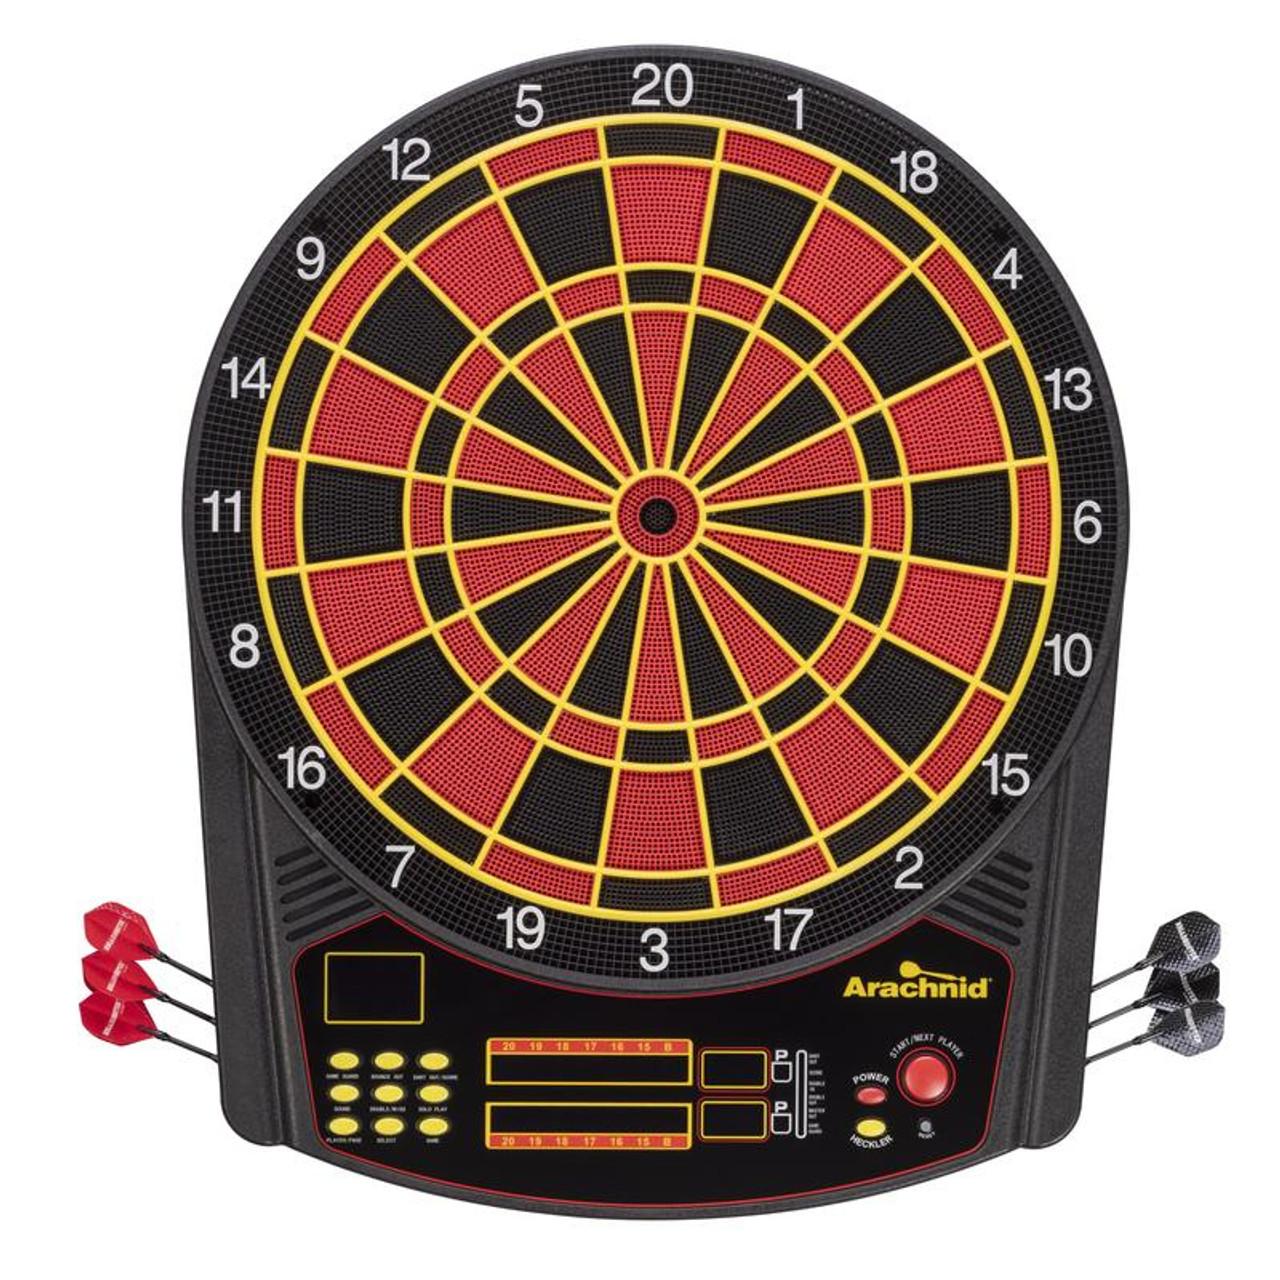 E450ARA. Arachnid®, Cricket, Pro 450, Dart, Board, FREE SHIPPING. electronic, soft tip